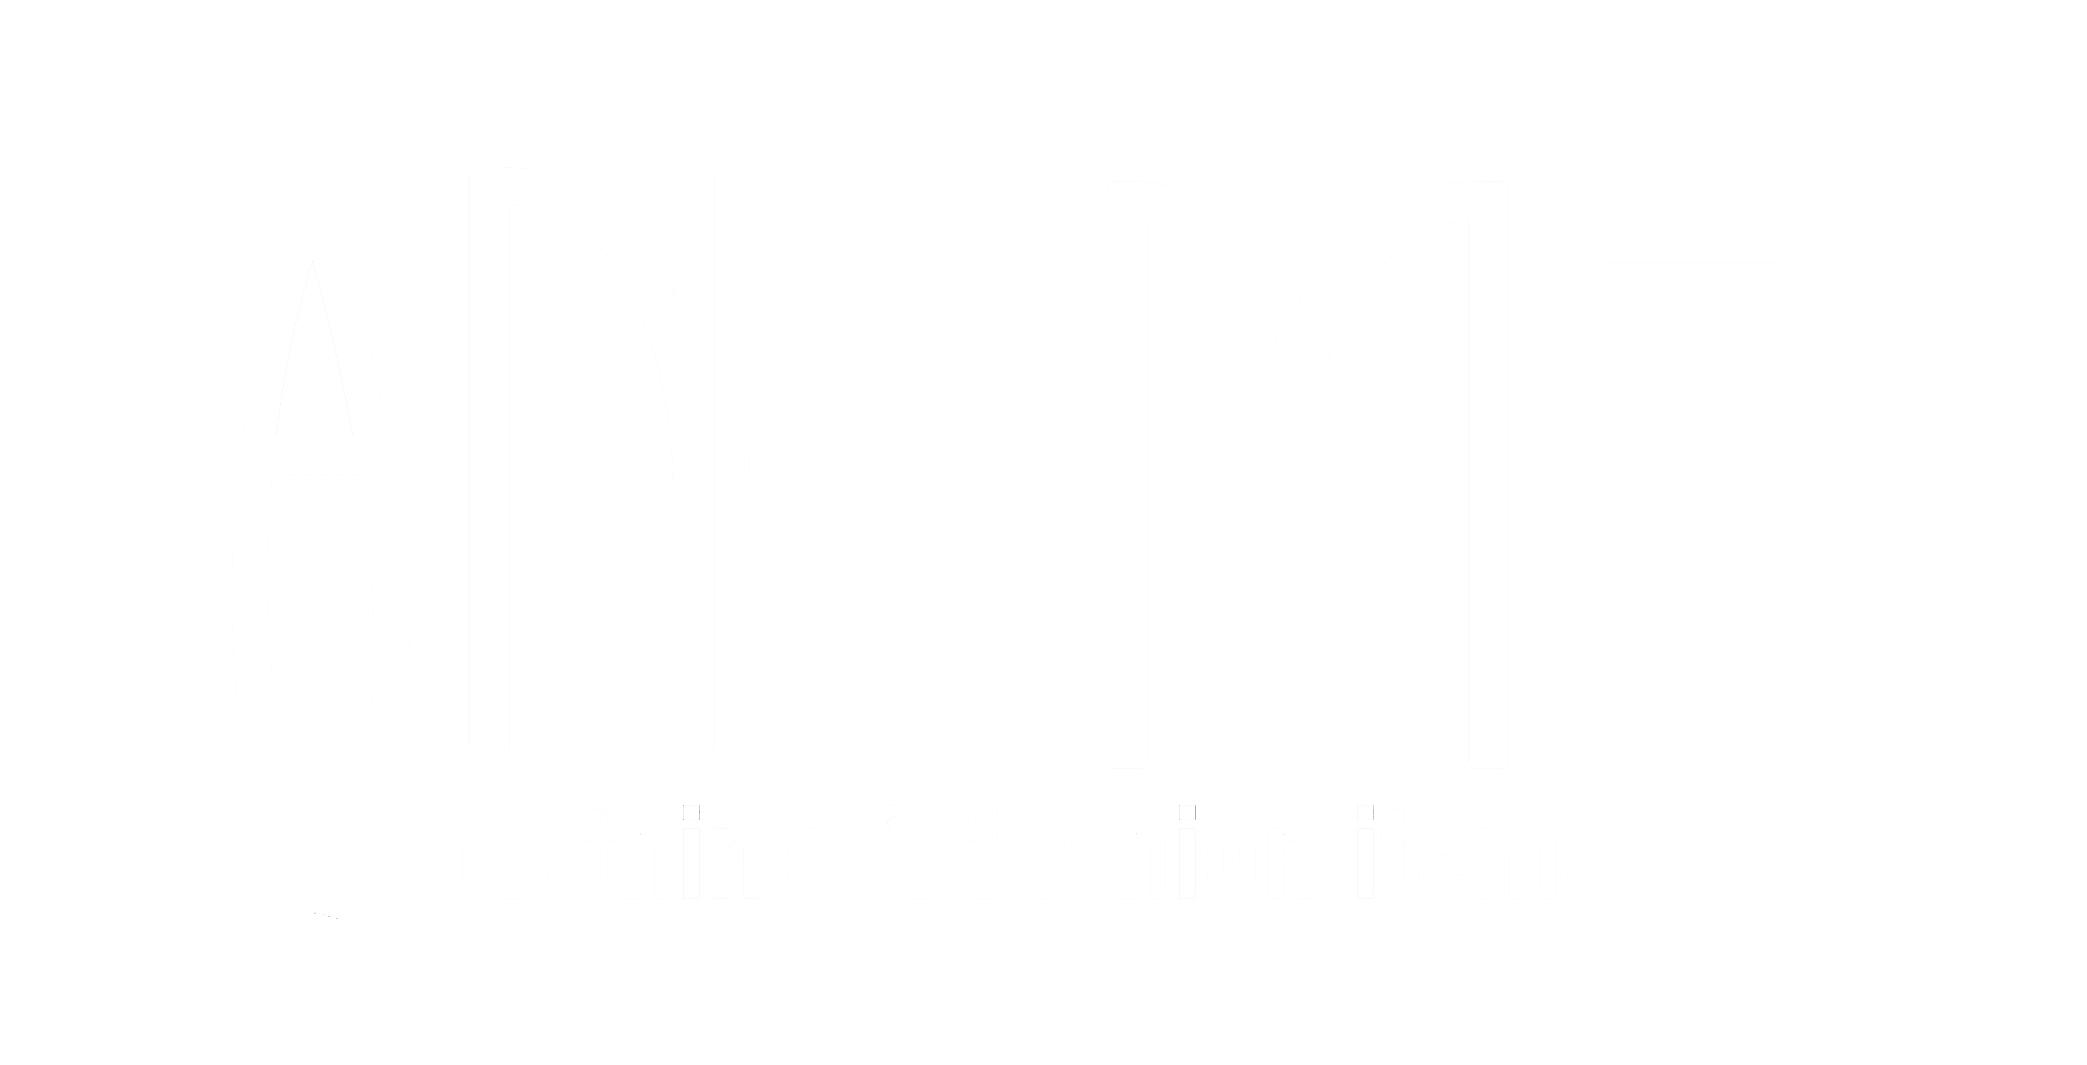 ANEMH clothing&fashion items-Γυναικεία ρούχα,τσάντες,παπούτσια και αξεσουάρ